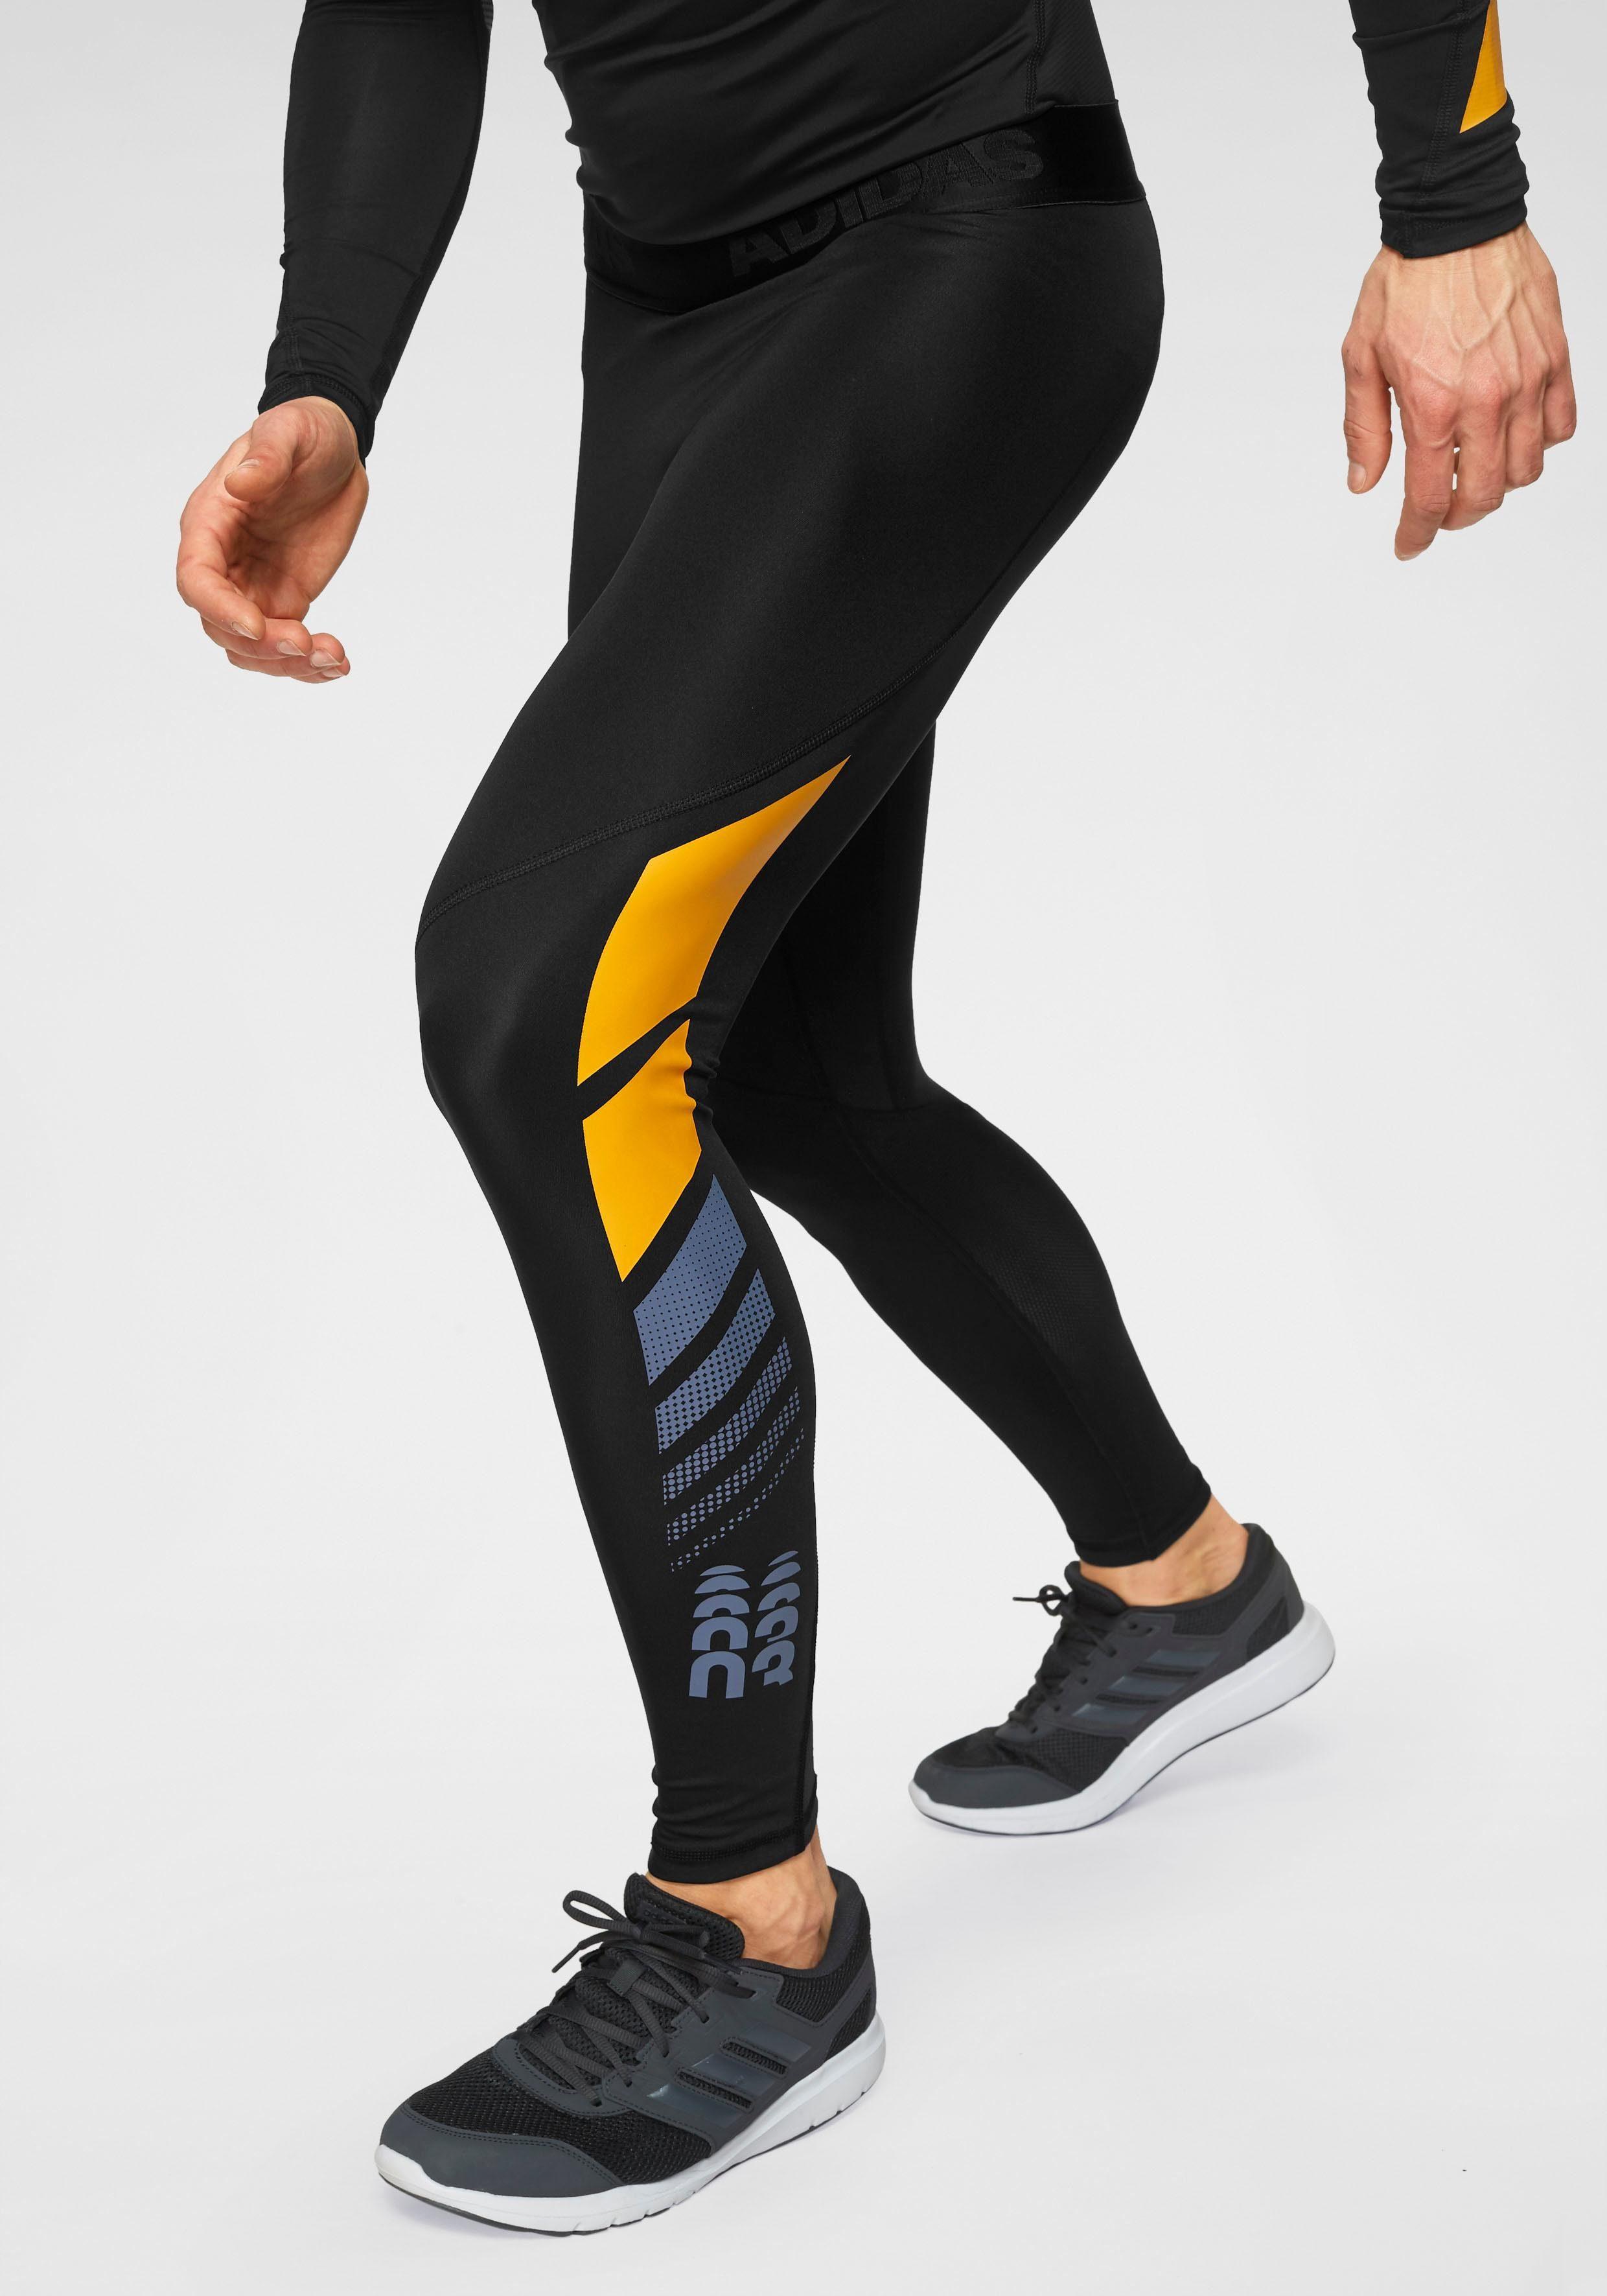 Adidas Alphaskin Sport lange Tight ab 17,92